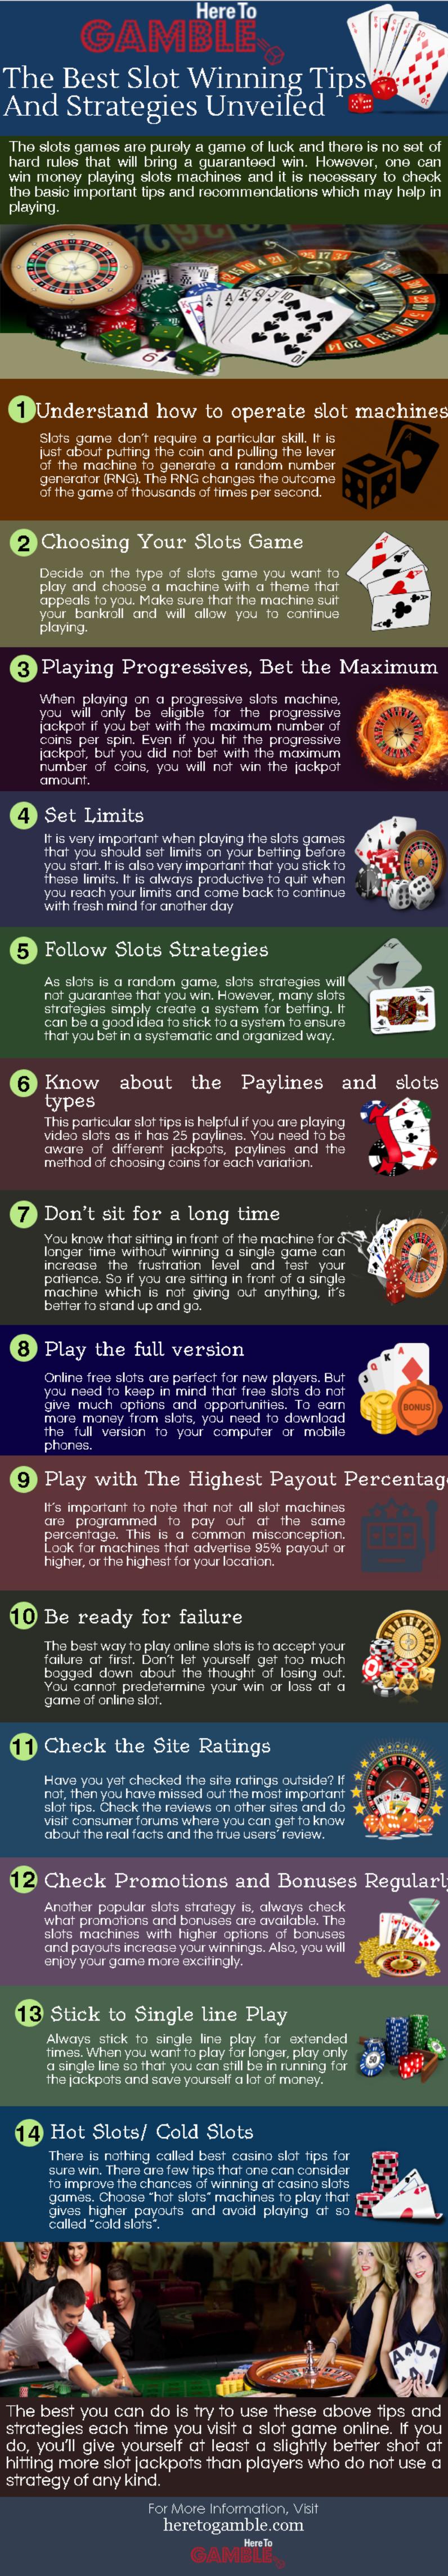 Online Casino Slots Strategy